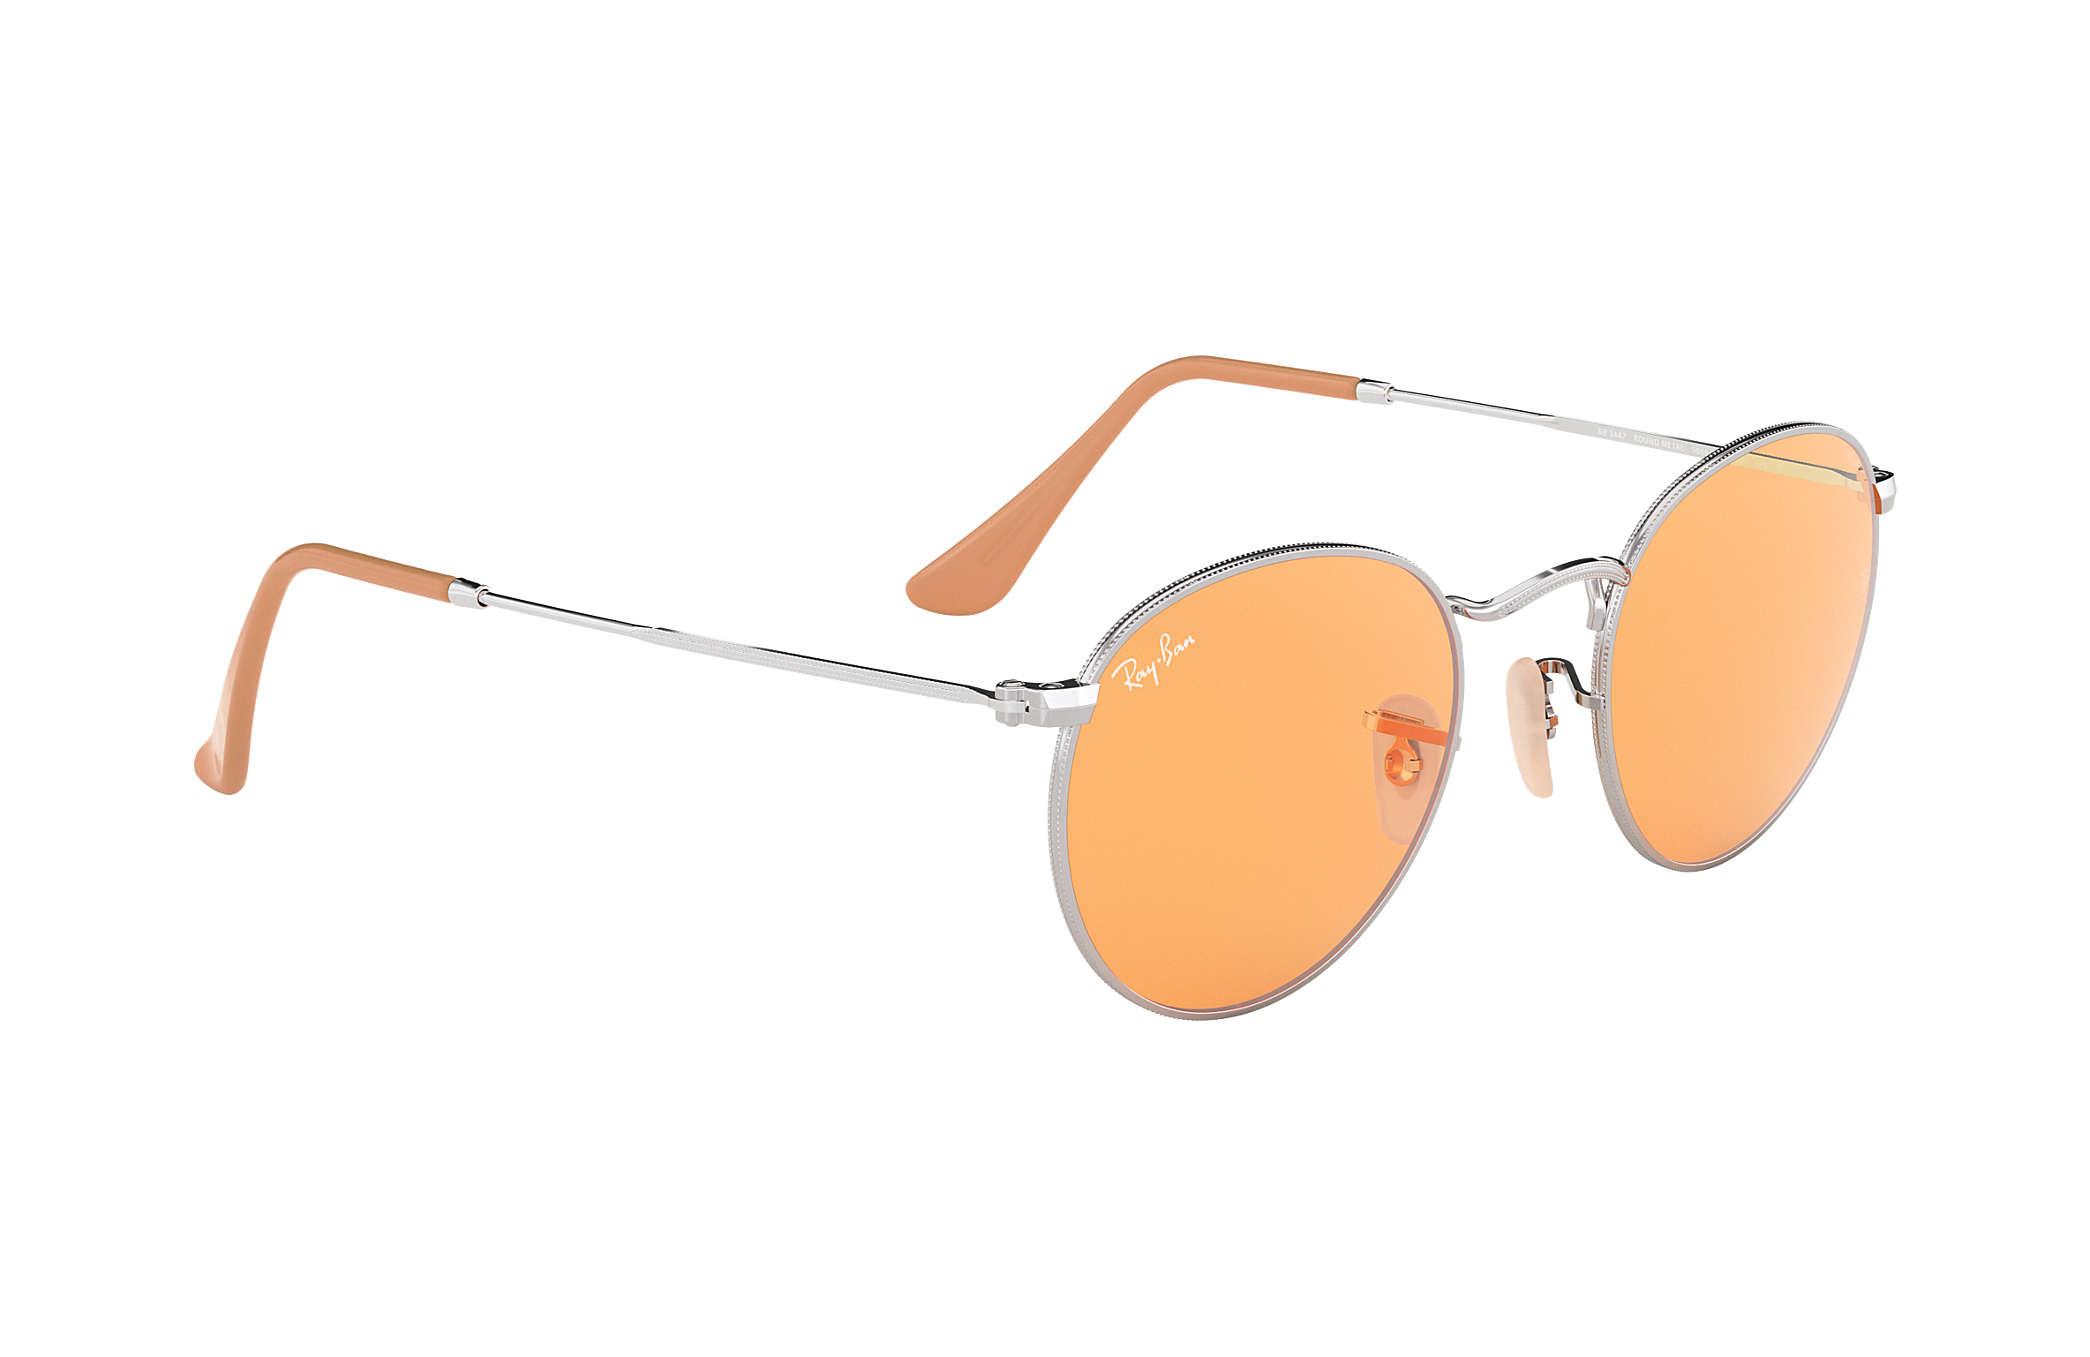 2d37971325d46b Ray-Ban Round Evolve RB3447 Silver - Metal - Orange Lenses ...